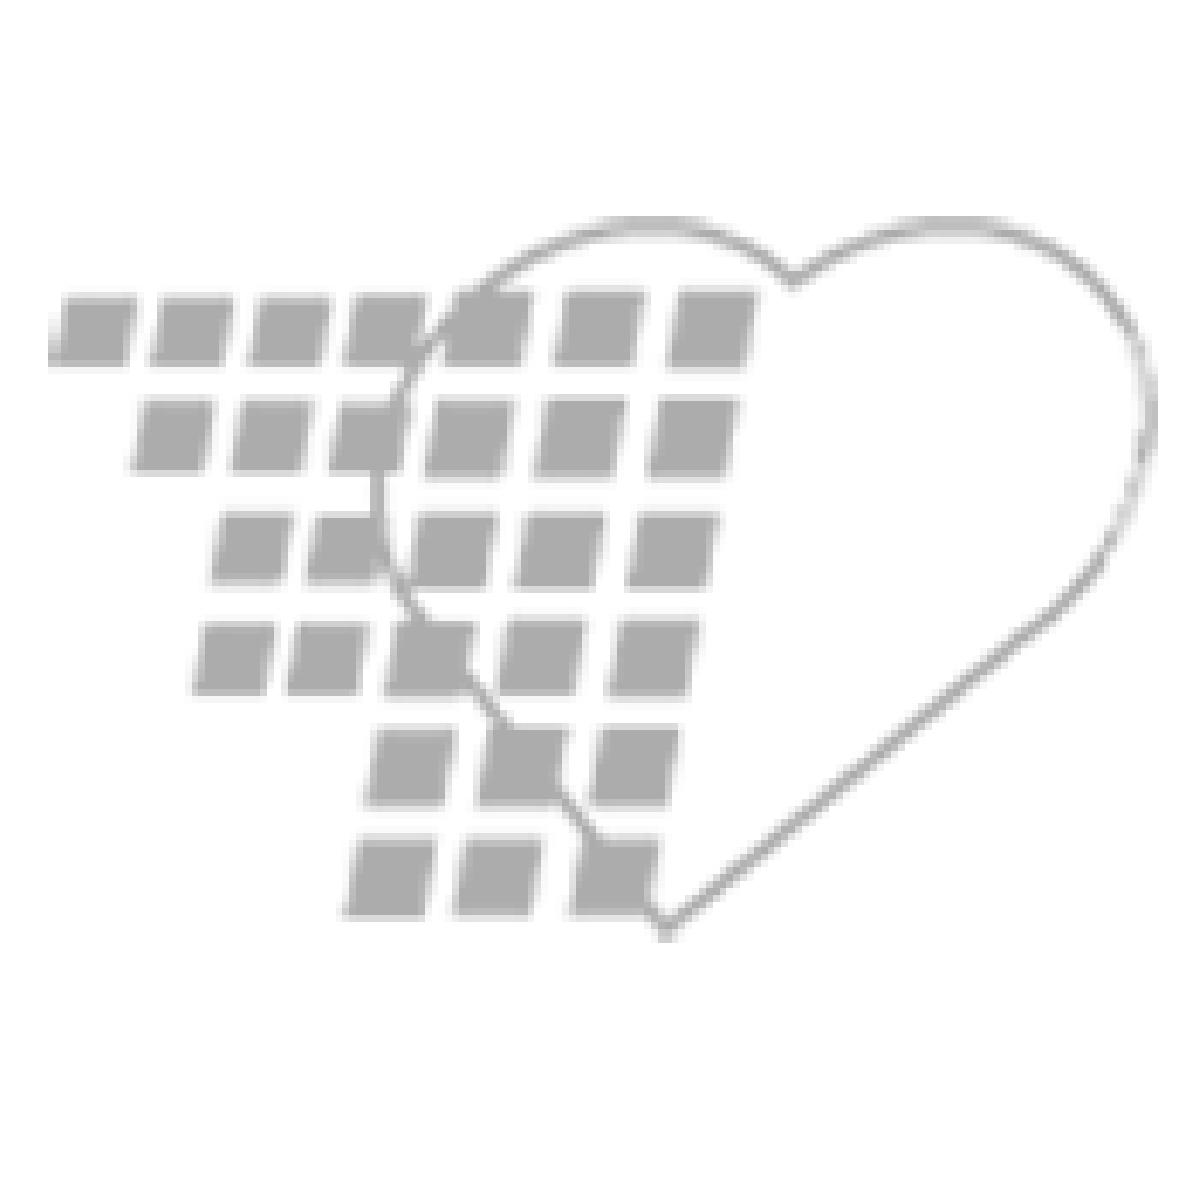 04-25-3021 Four-Shelf Manikin Cart Cover with Zipper